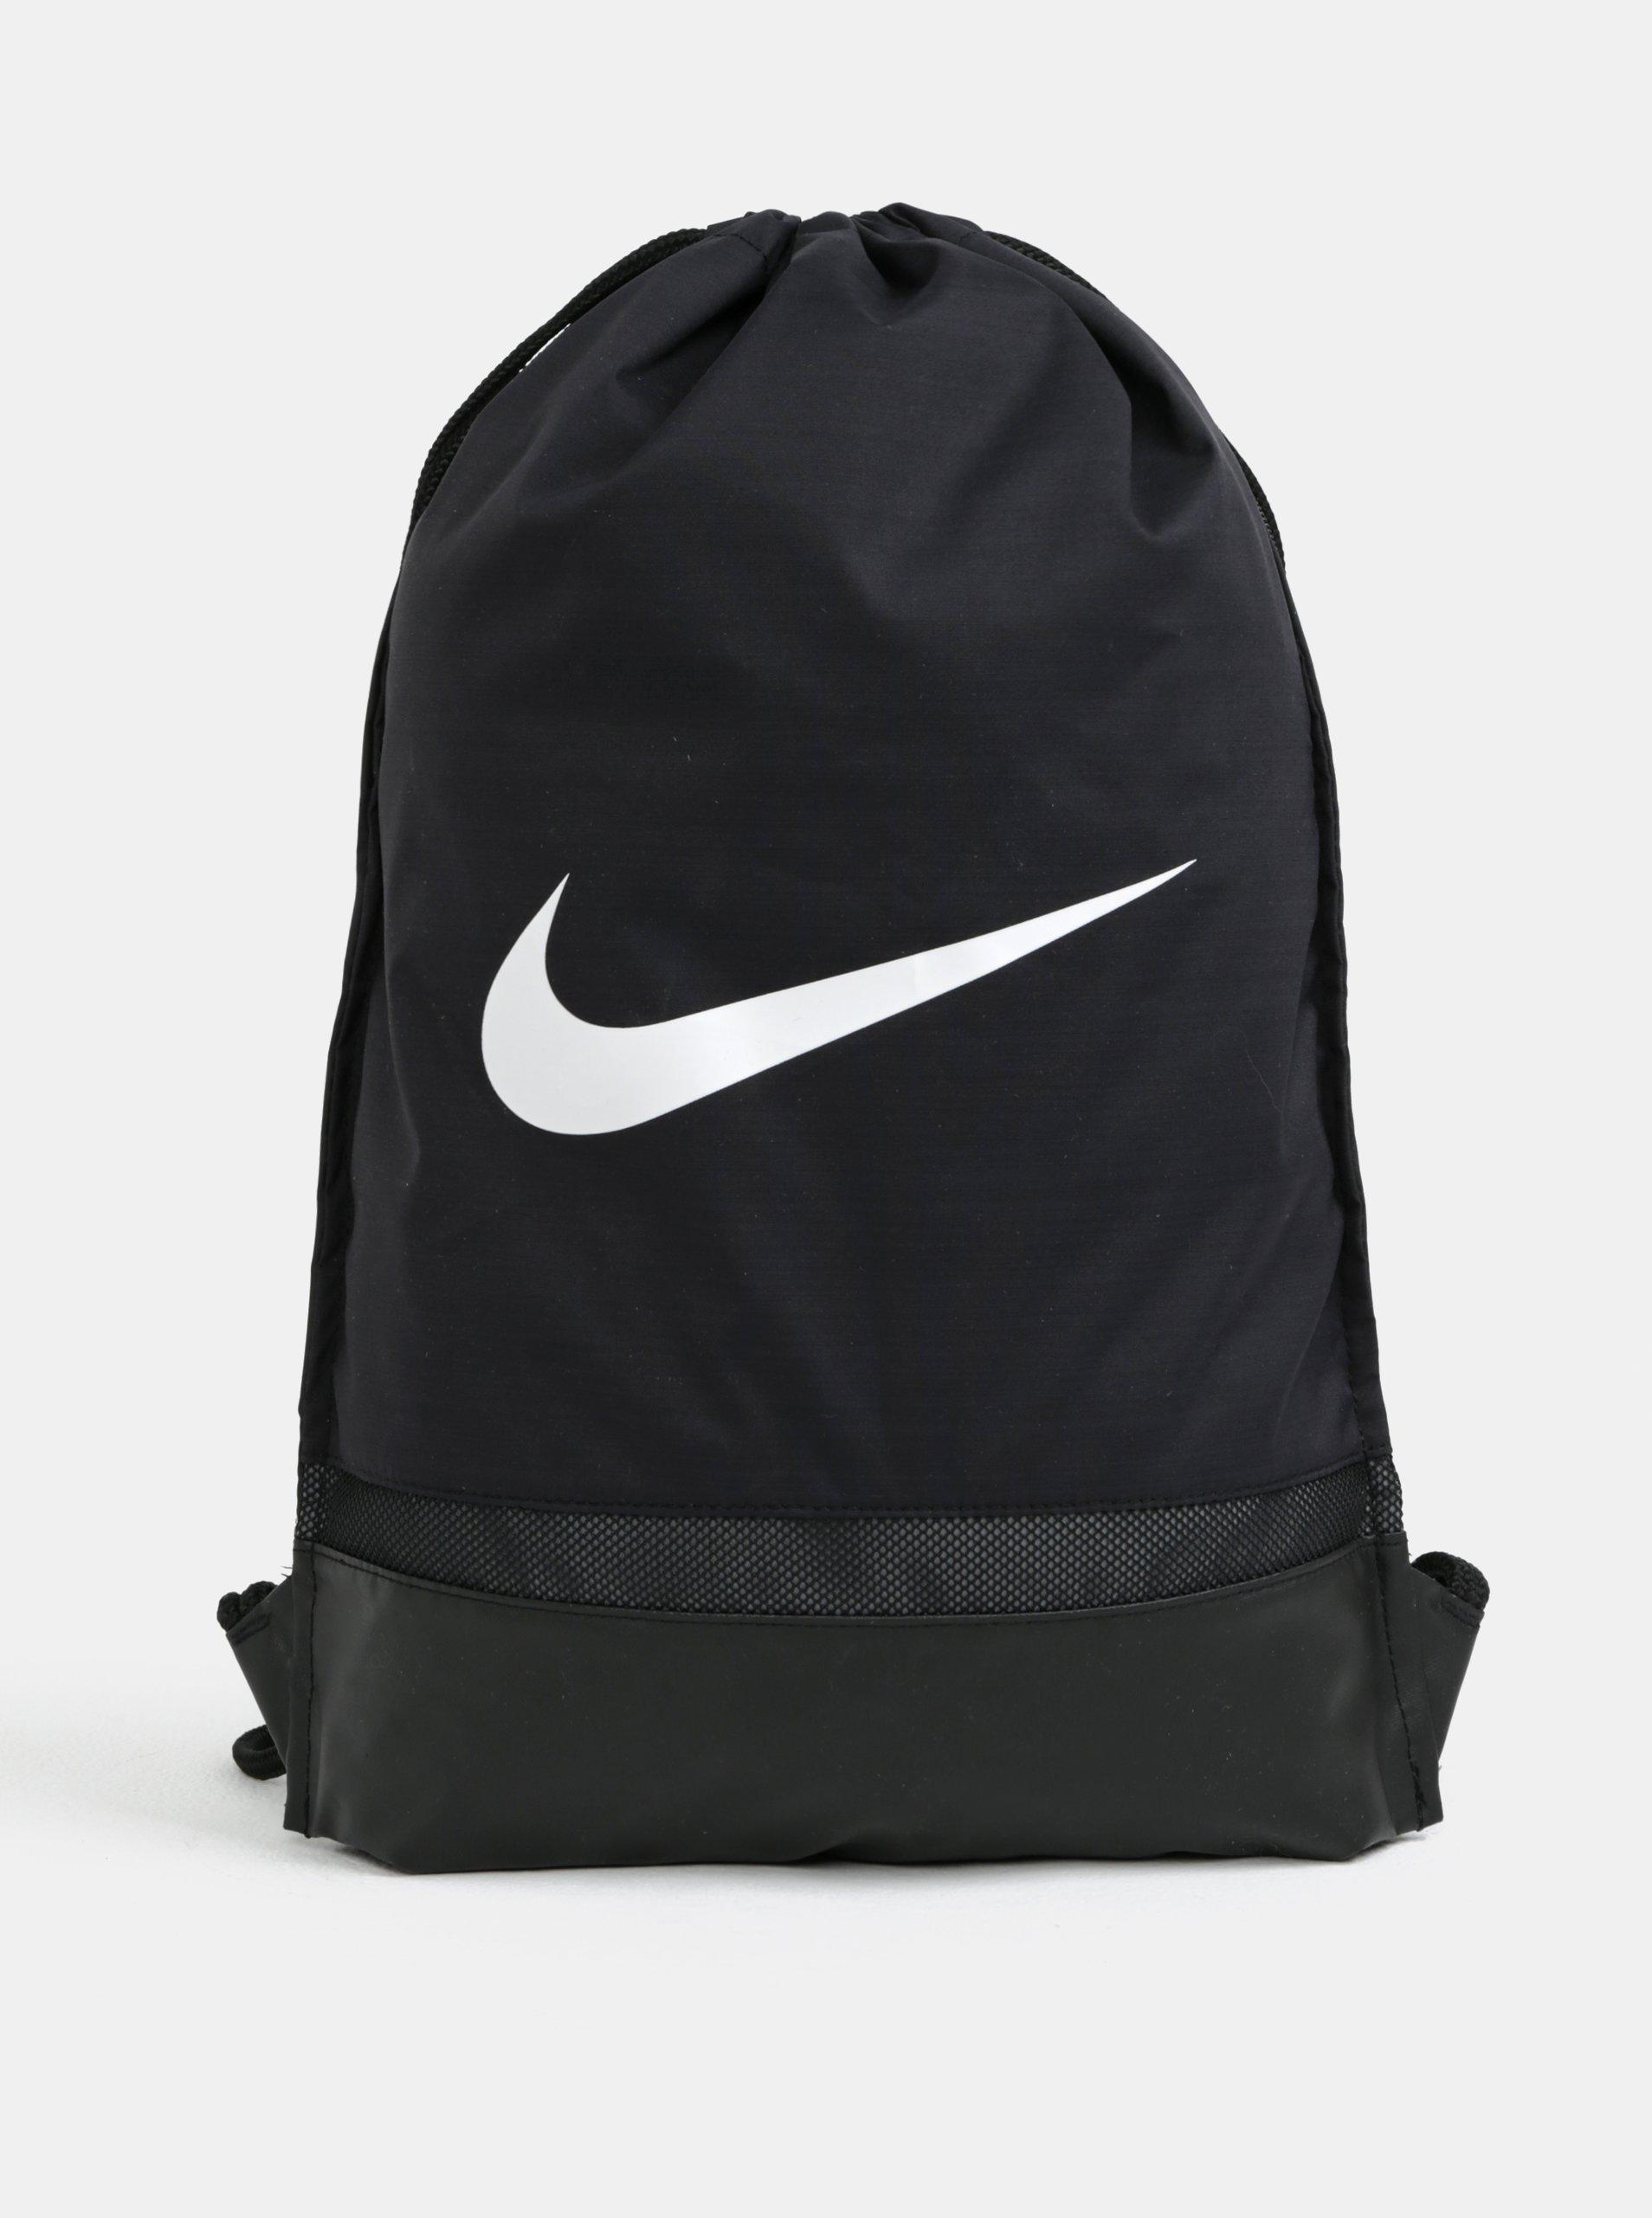 Černý voděodolný vak Nike Brasilia